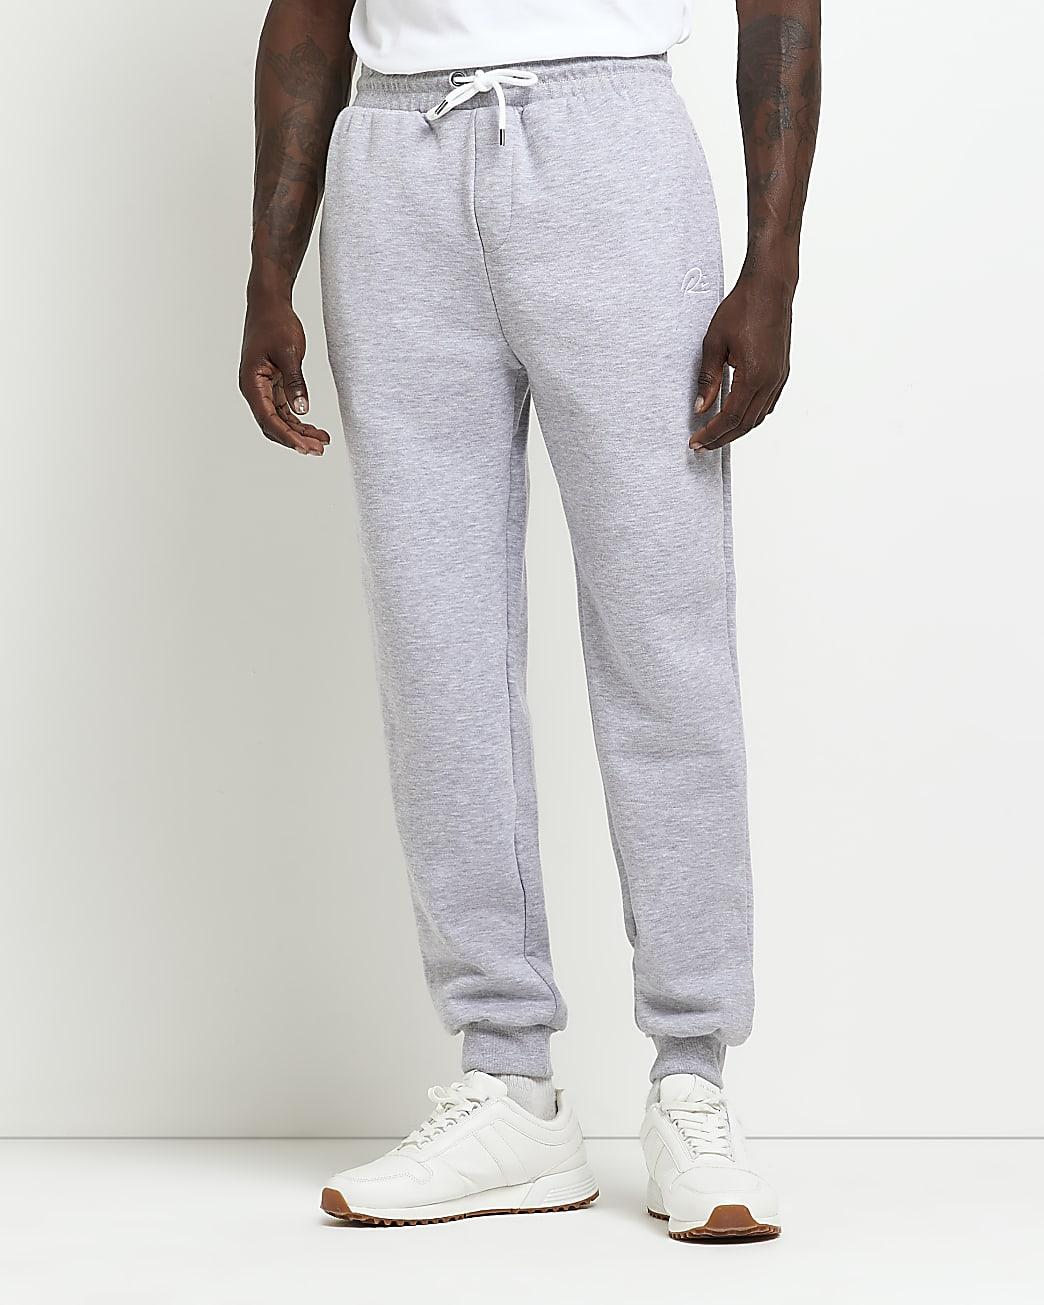 Grey RI slim fit joggers